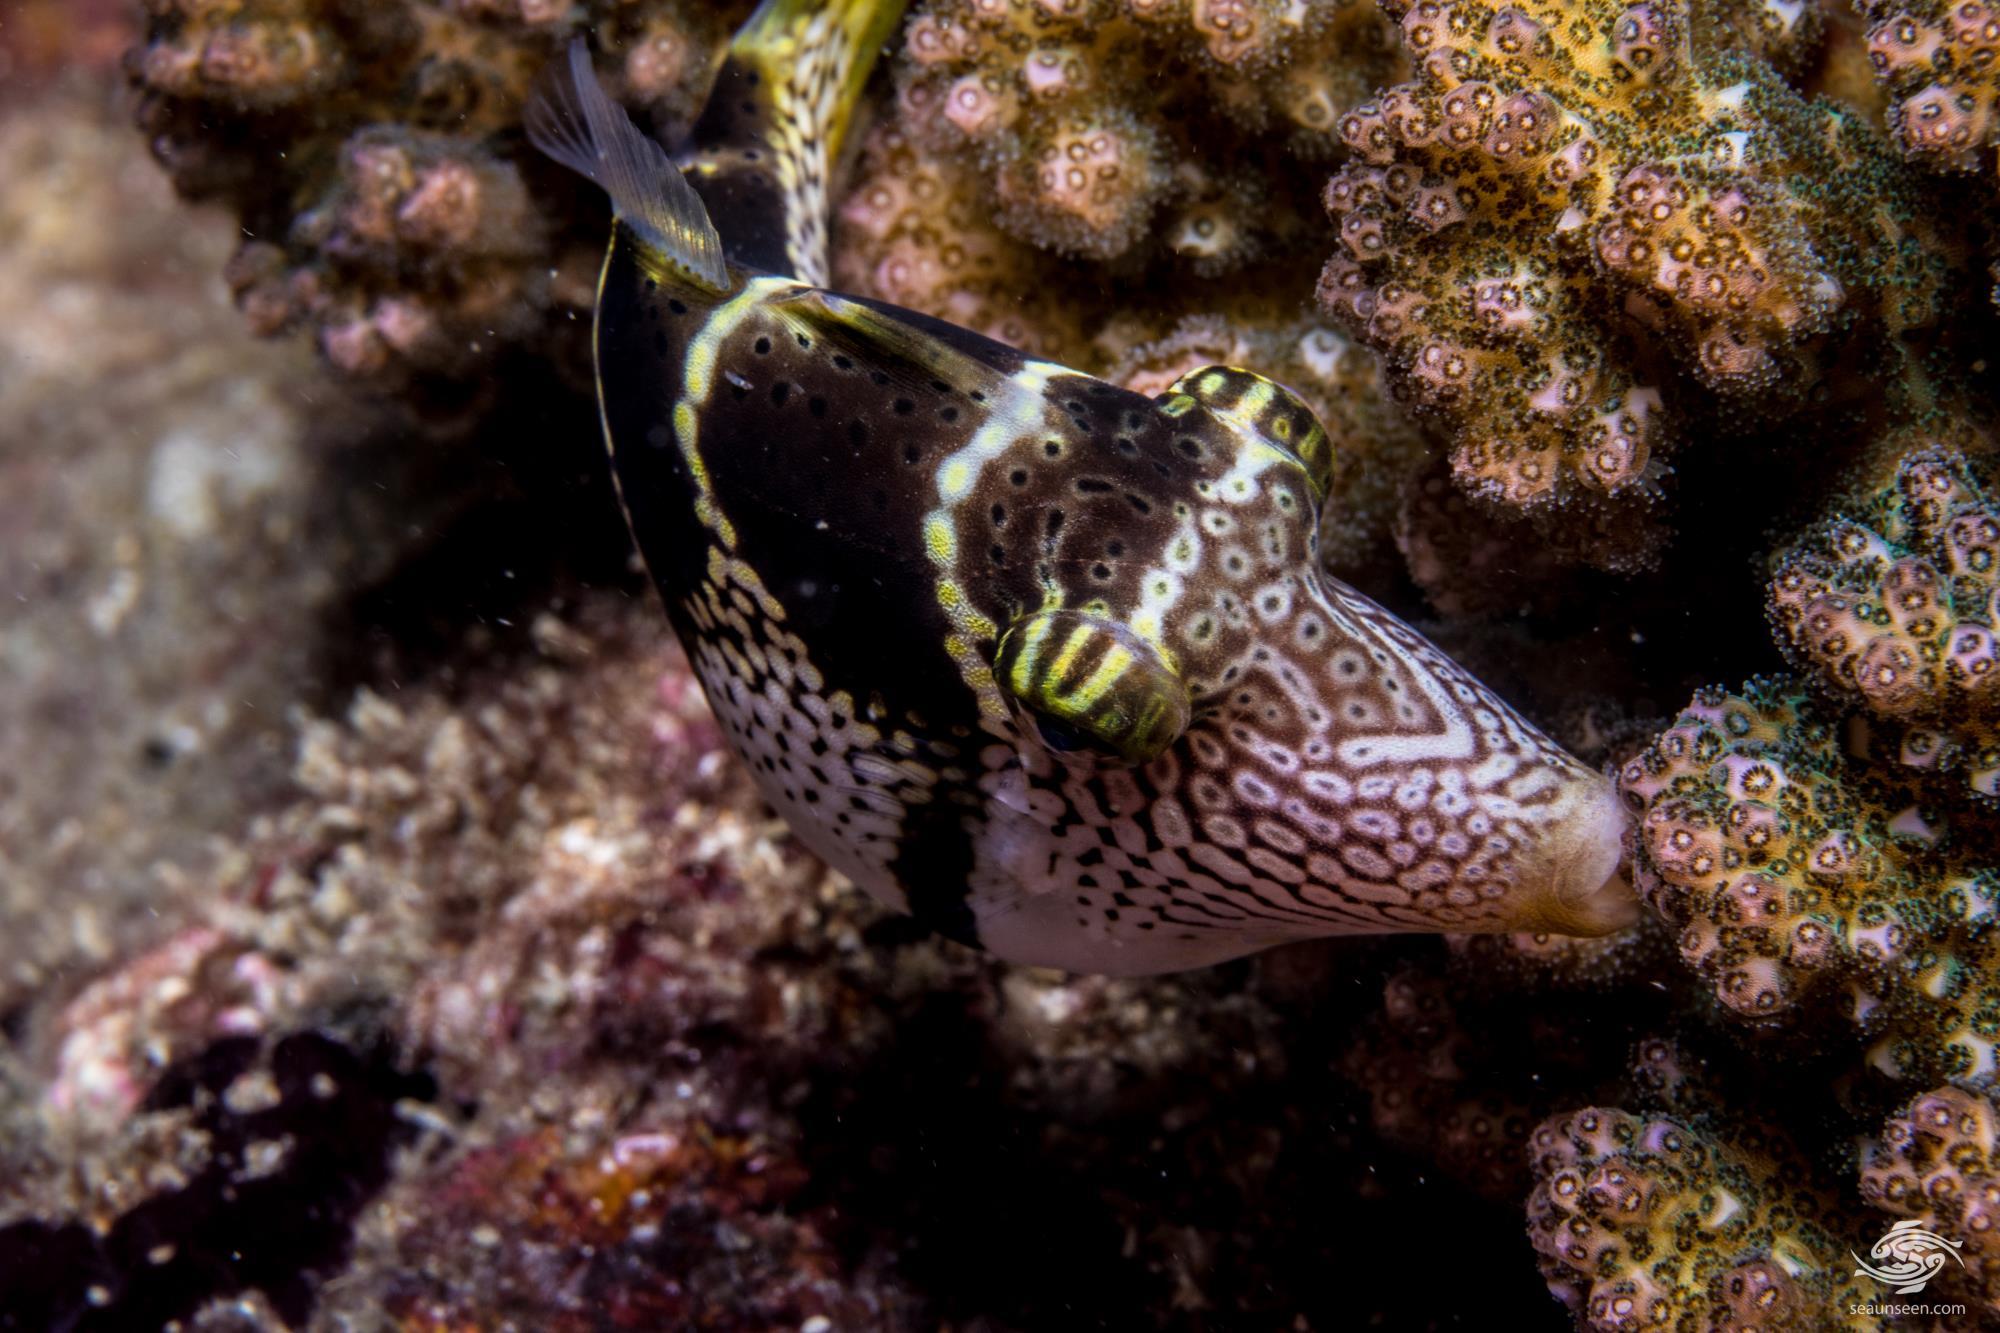 Filefish biting onto corals at night